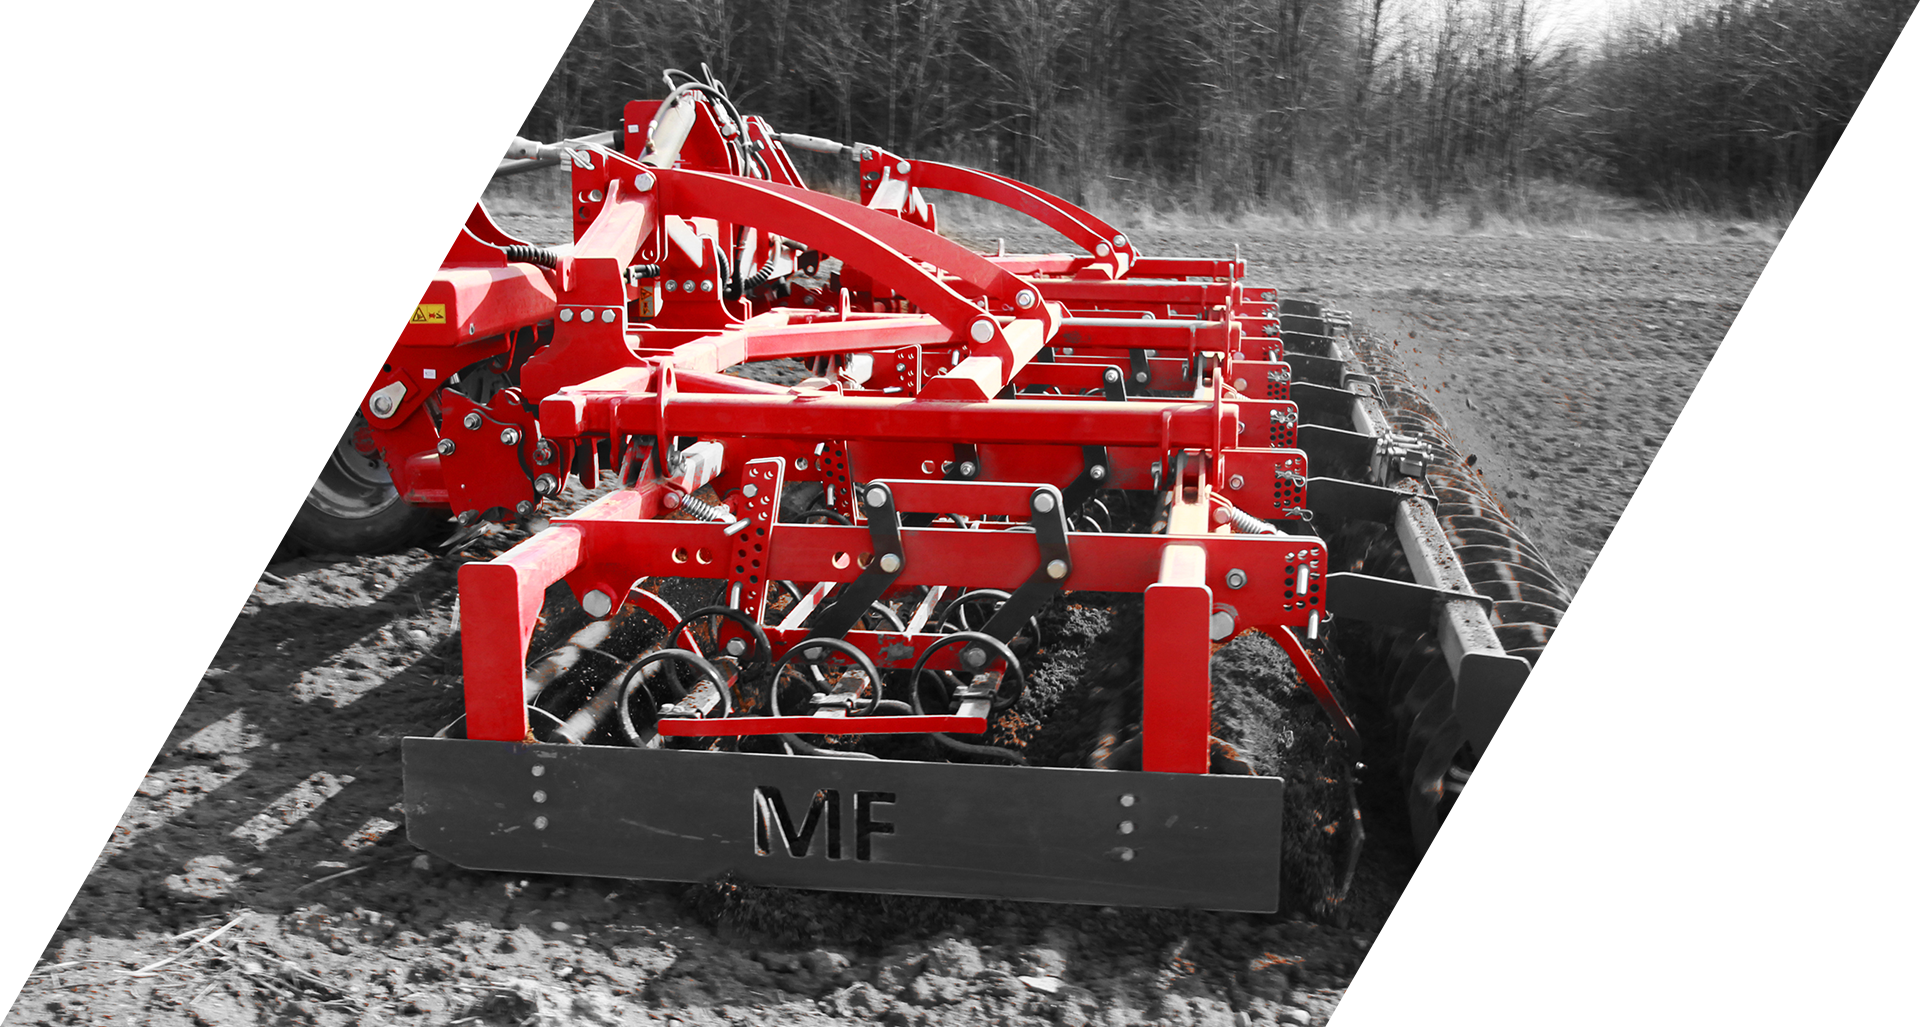 MF Cultivators